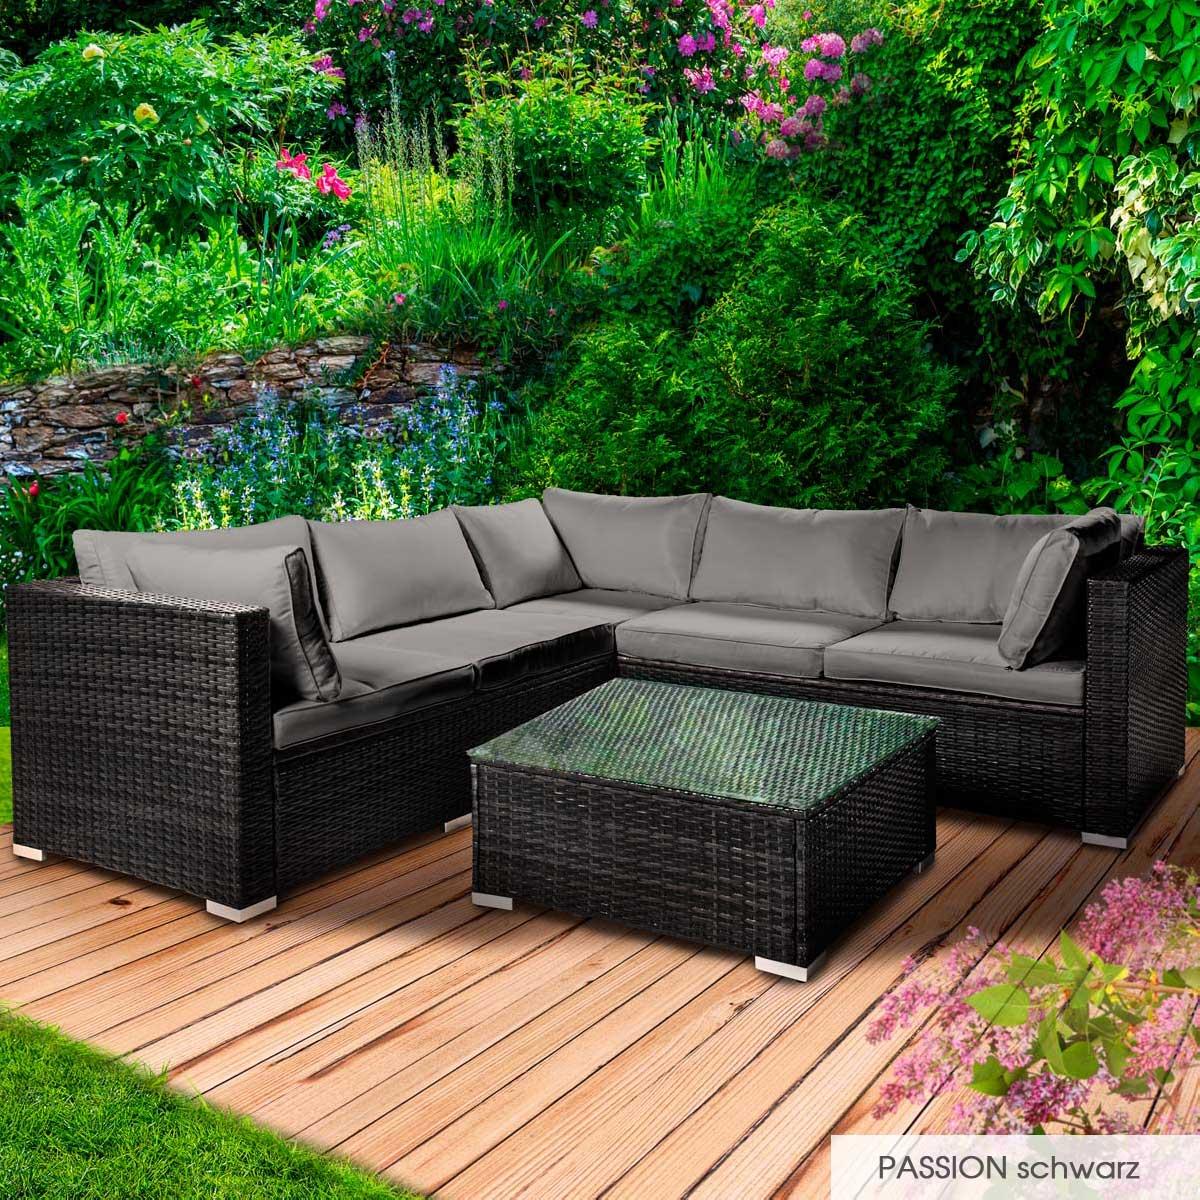 Gartenmoebel-Poly-Rattan-Lounge-Moebel-Sitzgarnitur-Gartengarnitur-Sitzgruppe-Sofa Indexbild 19